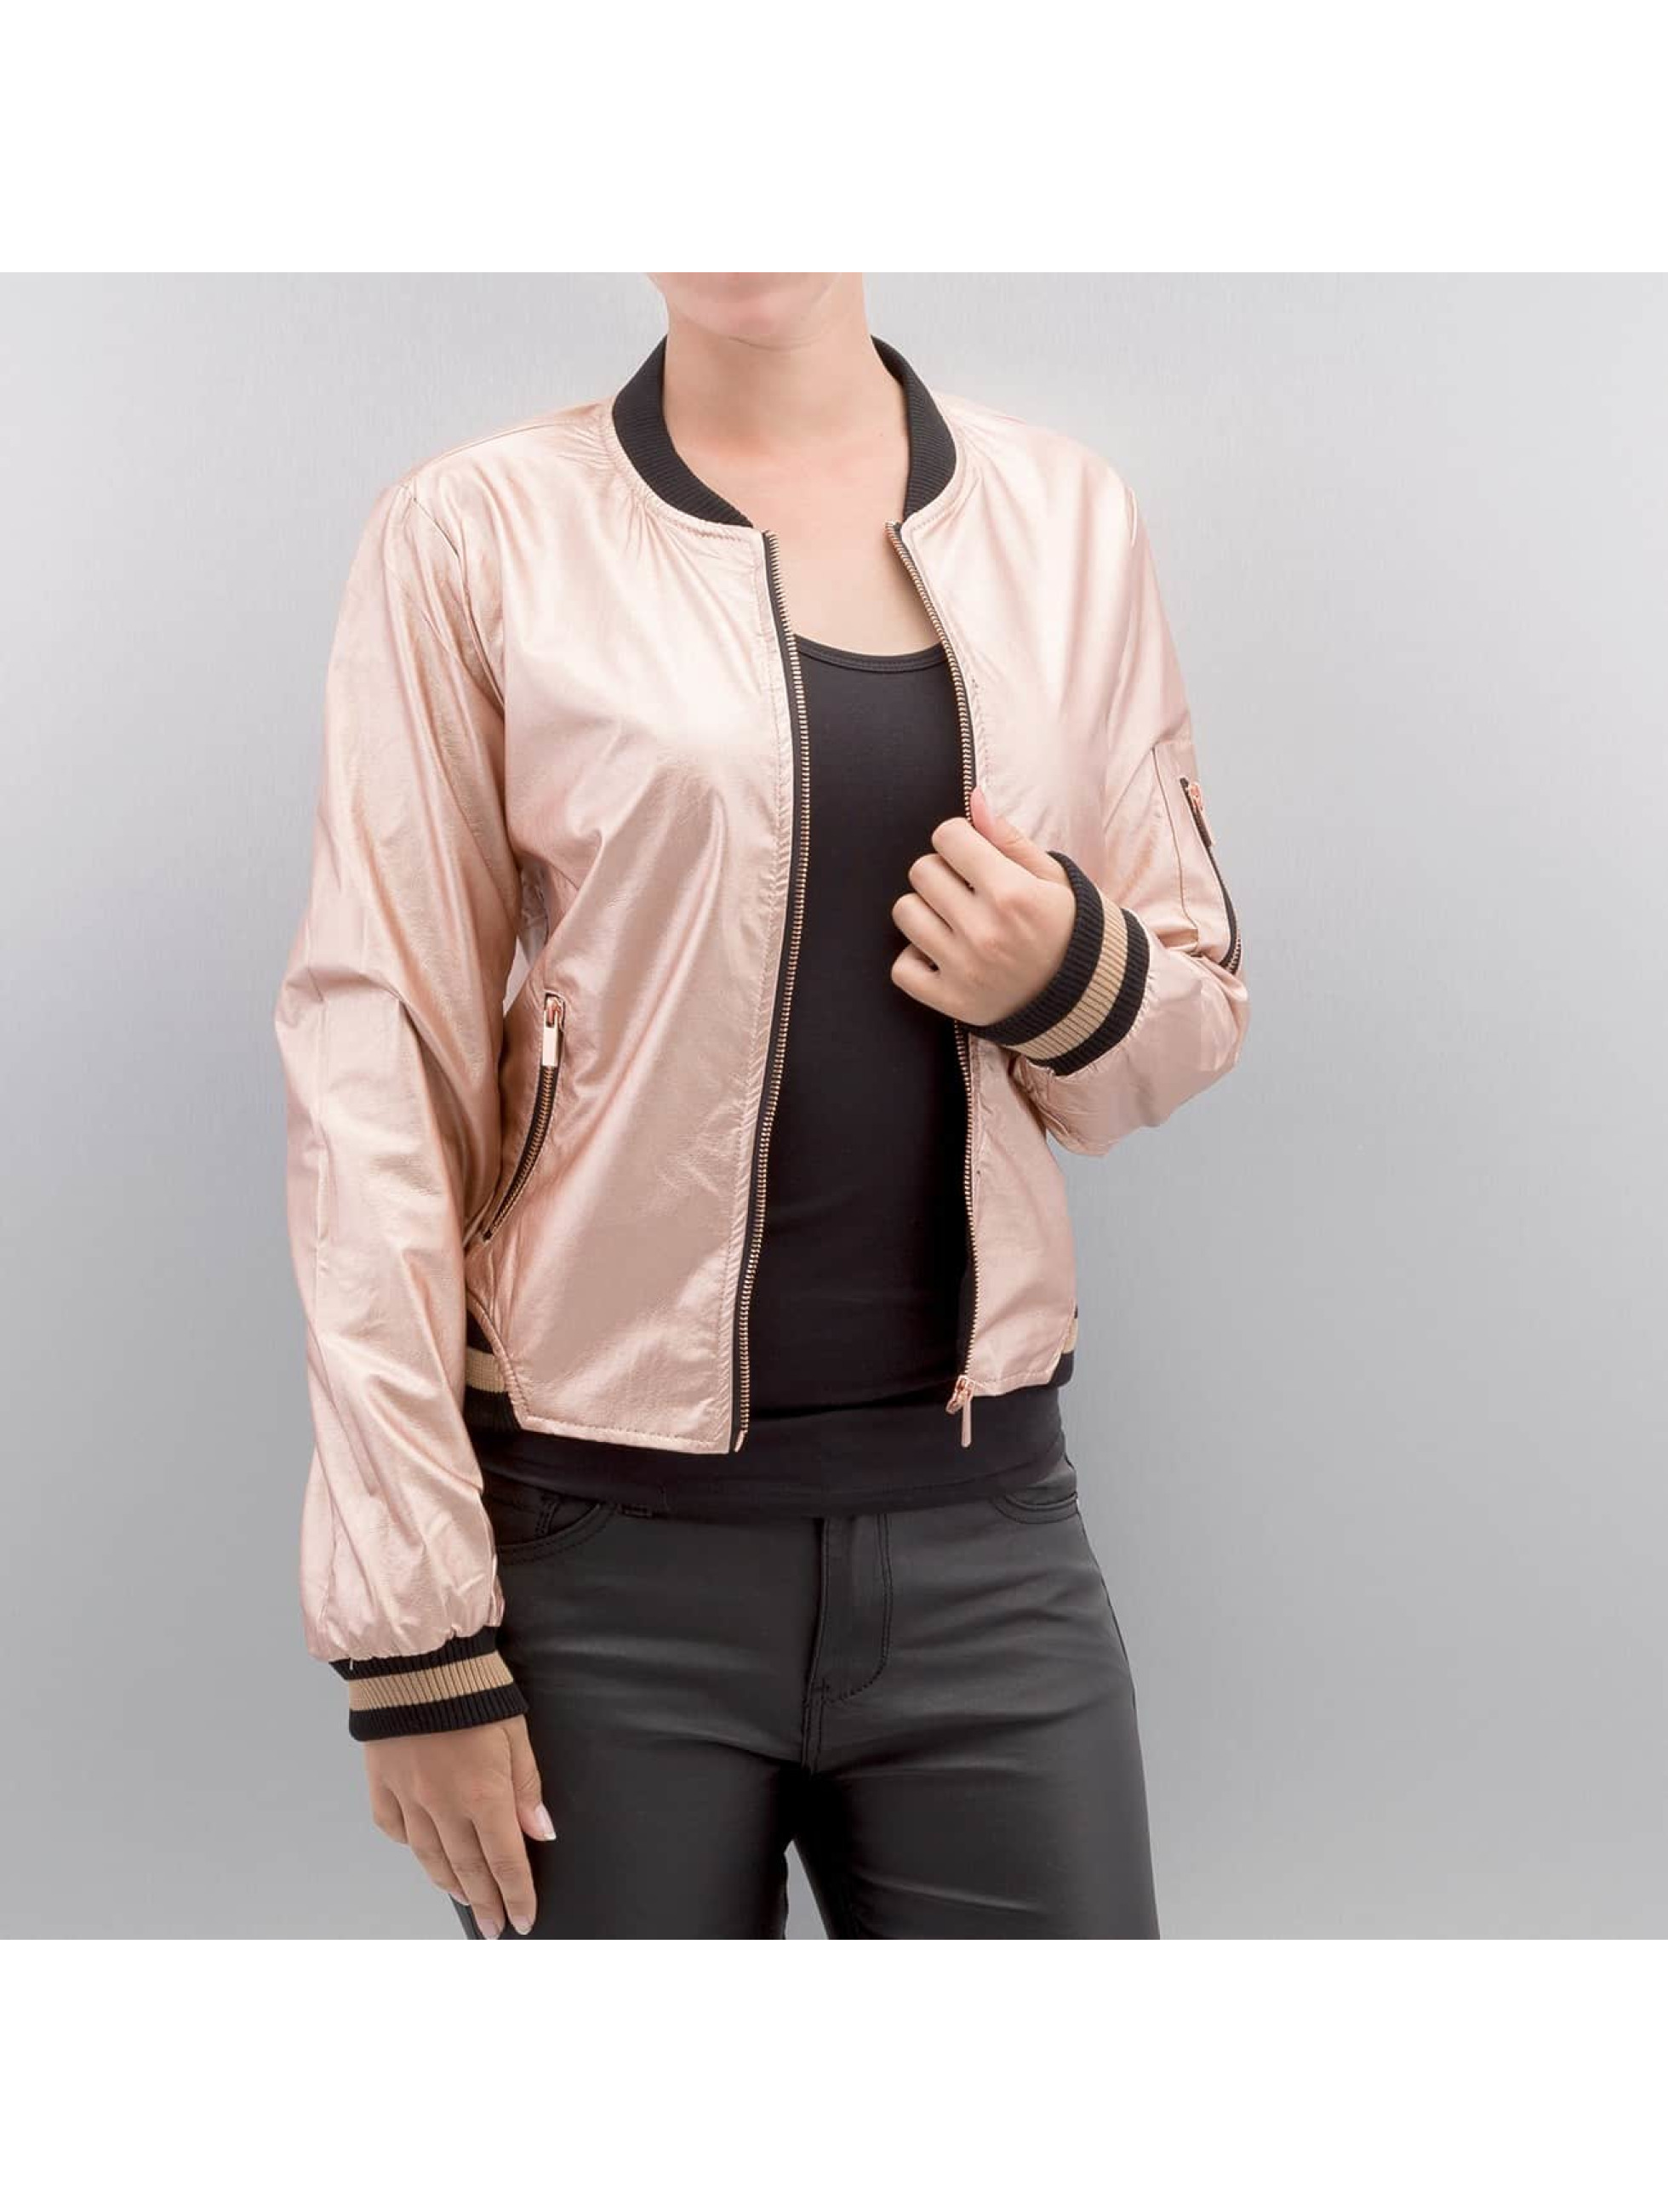 Hailys Frauen Lederjacke Bonnie in rosa